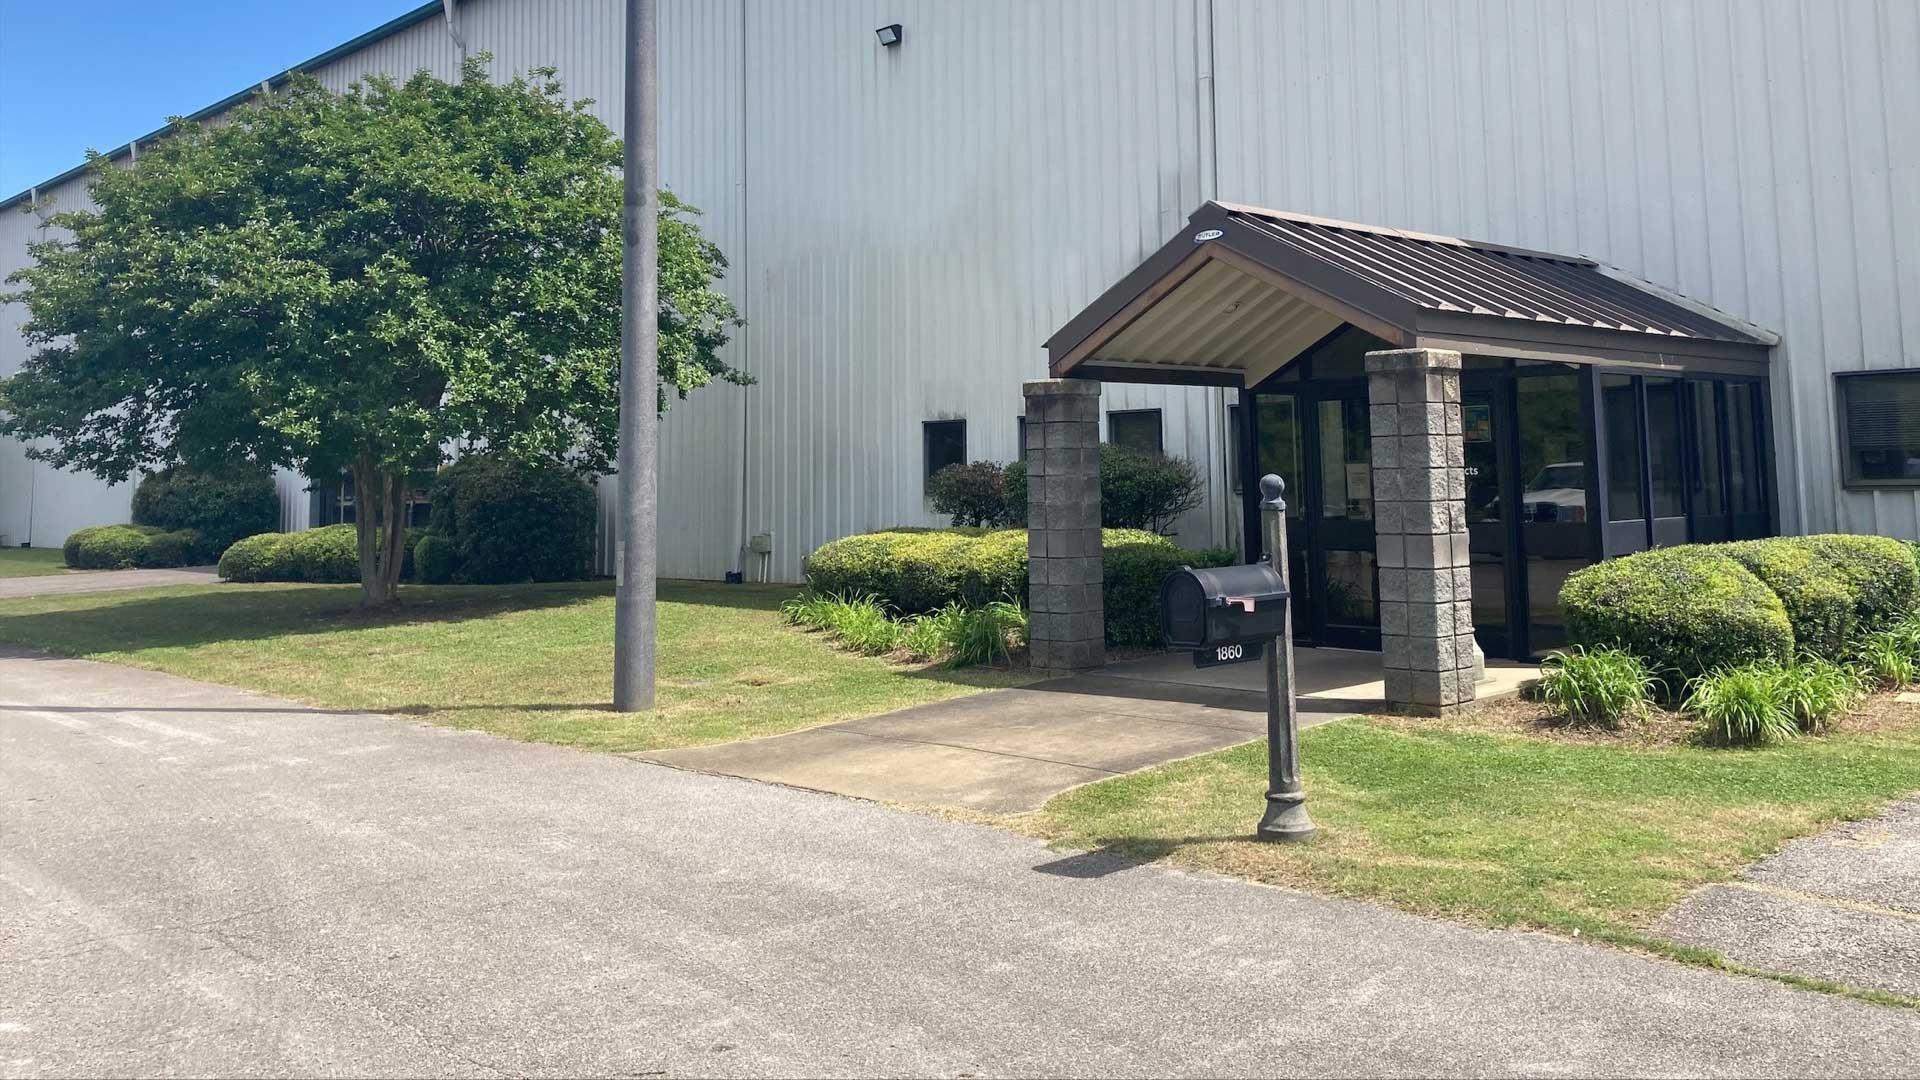 Mailbox Pole at Anniston Facility